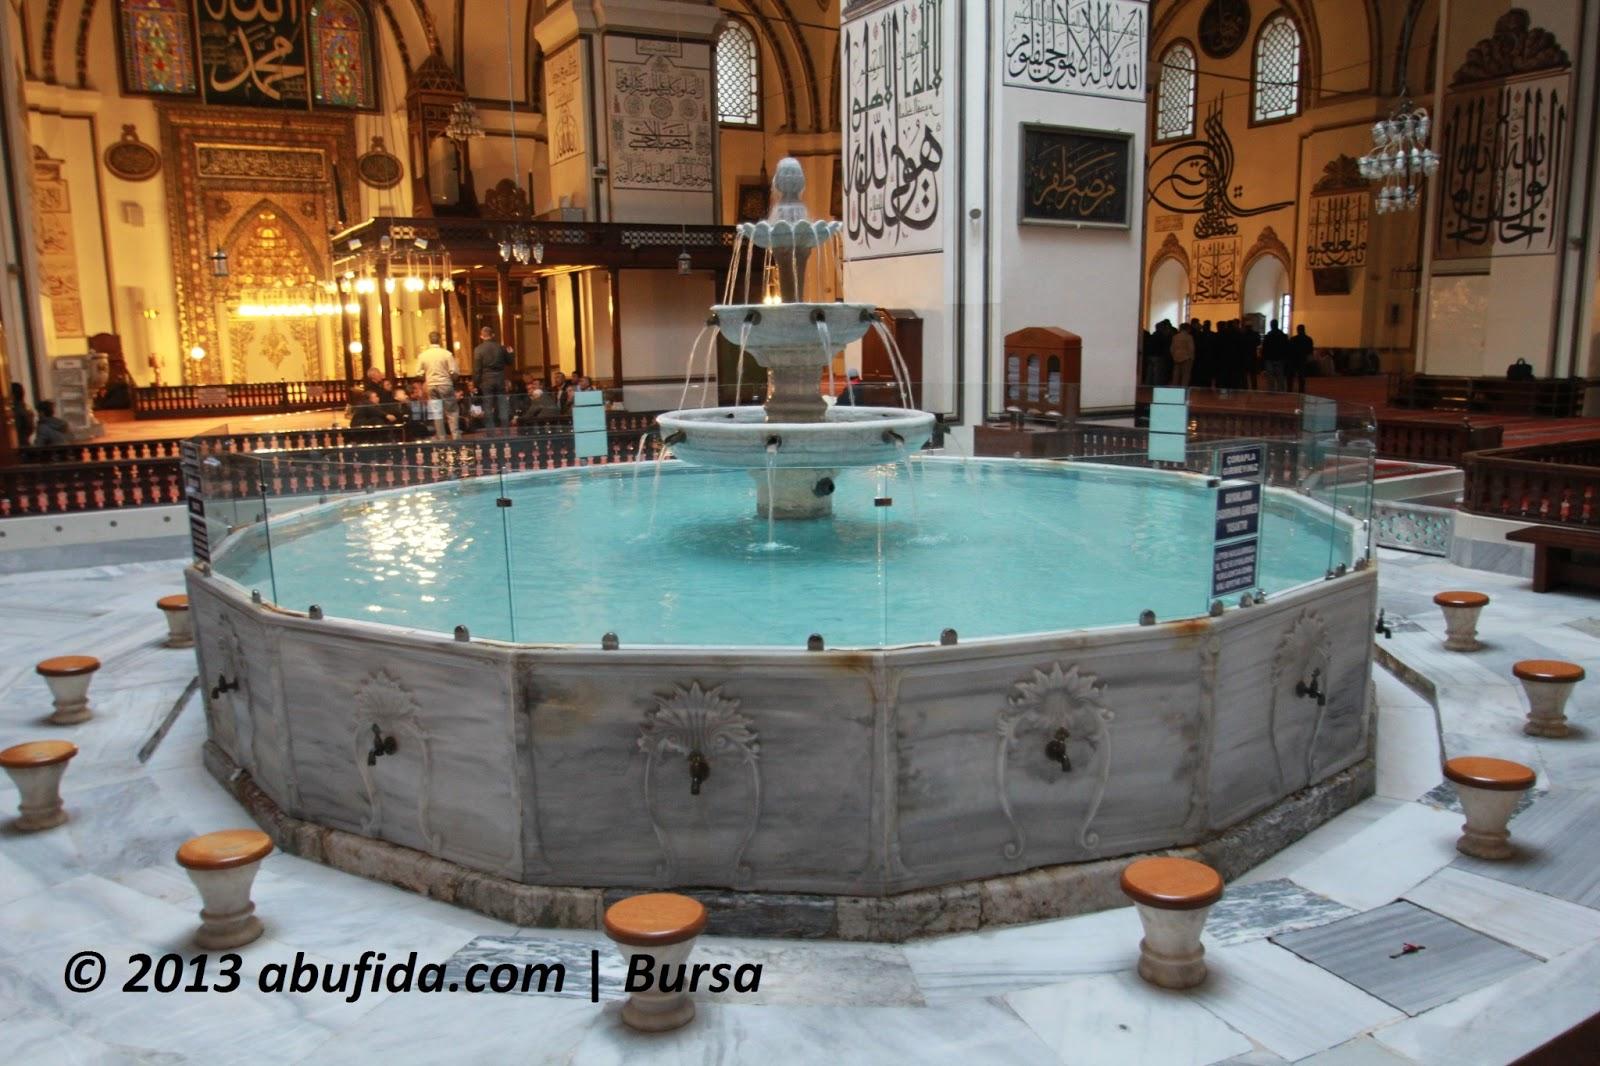 Al Turki Resort Al Hada Keliling Turki 2 Bursa Dari Sini Semua Bermula Abu Fida